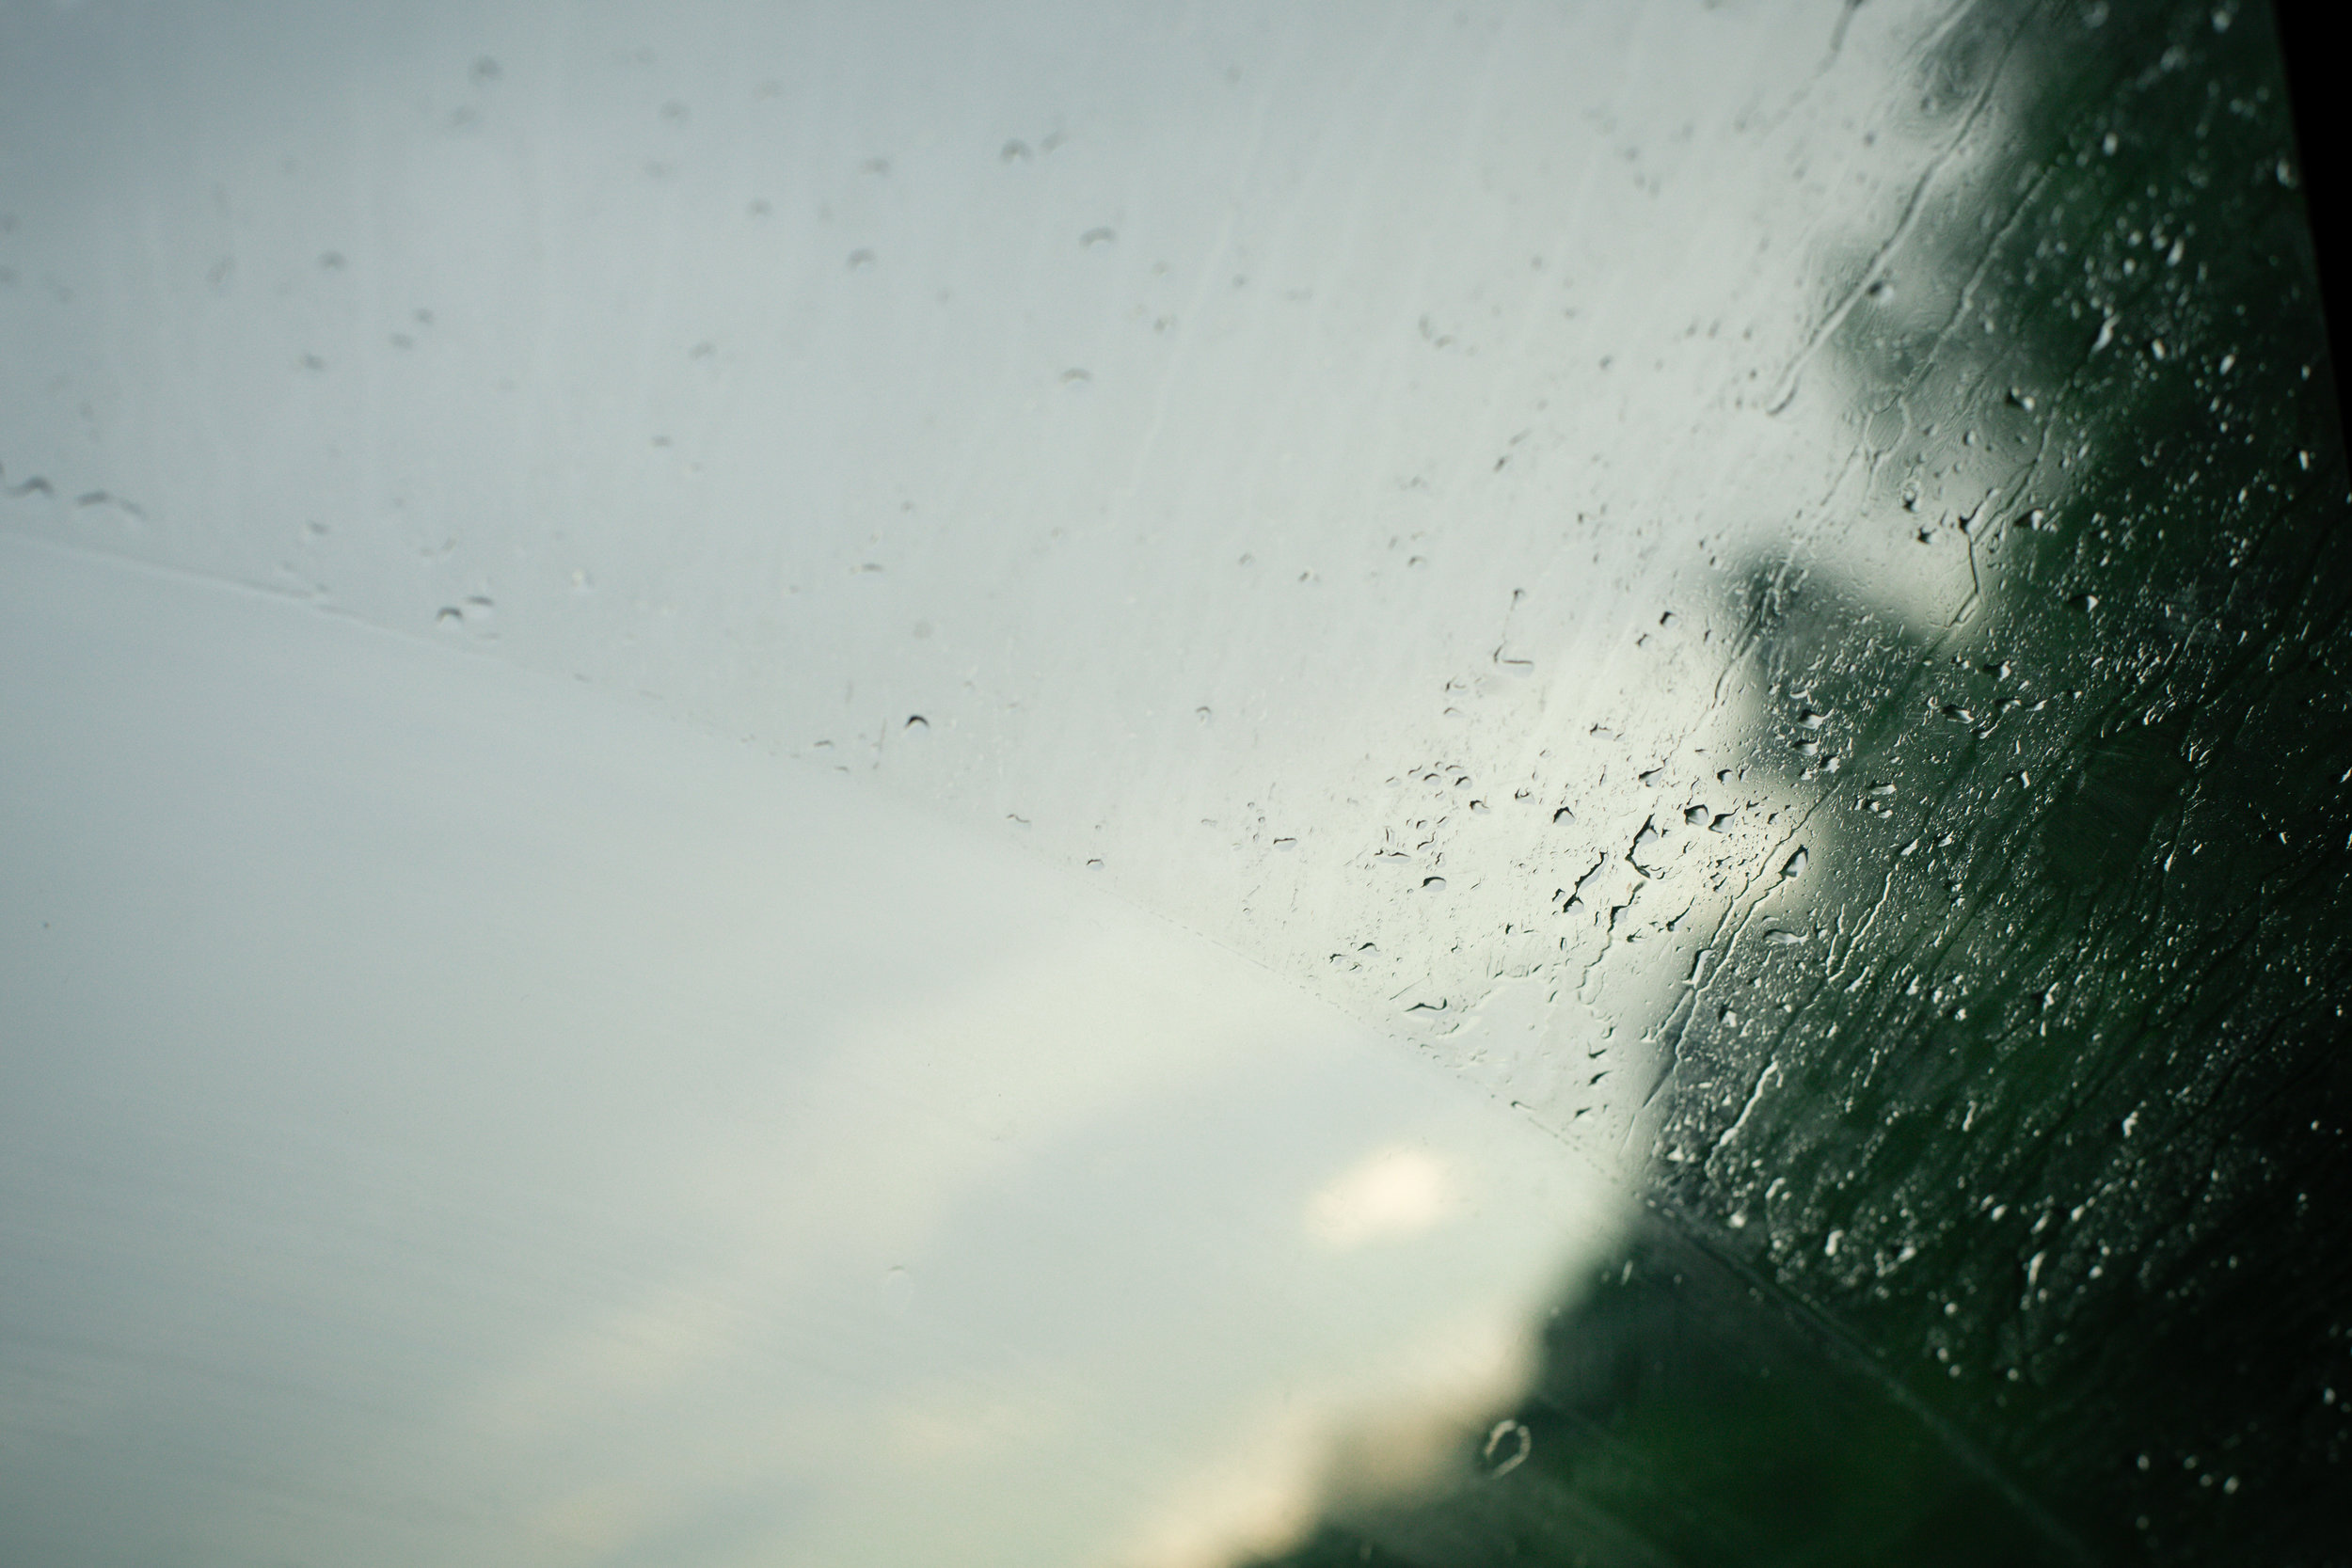 151 // 366 Rainy day back home running errands